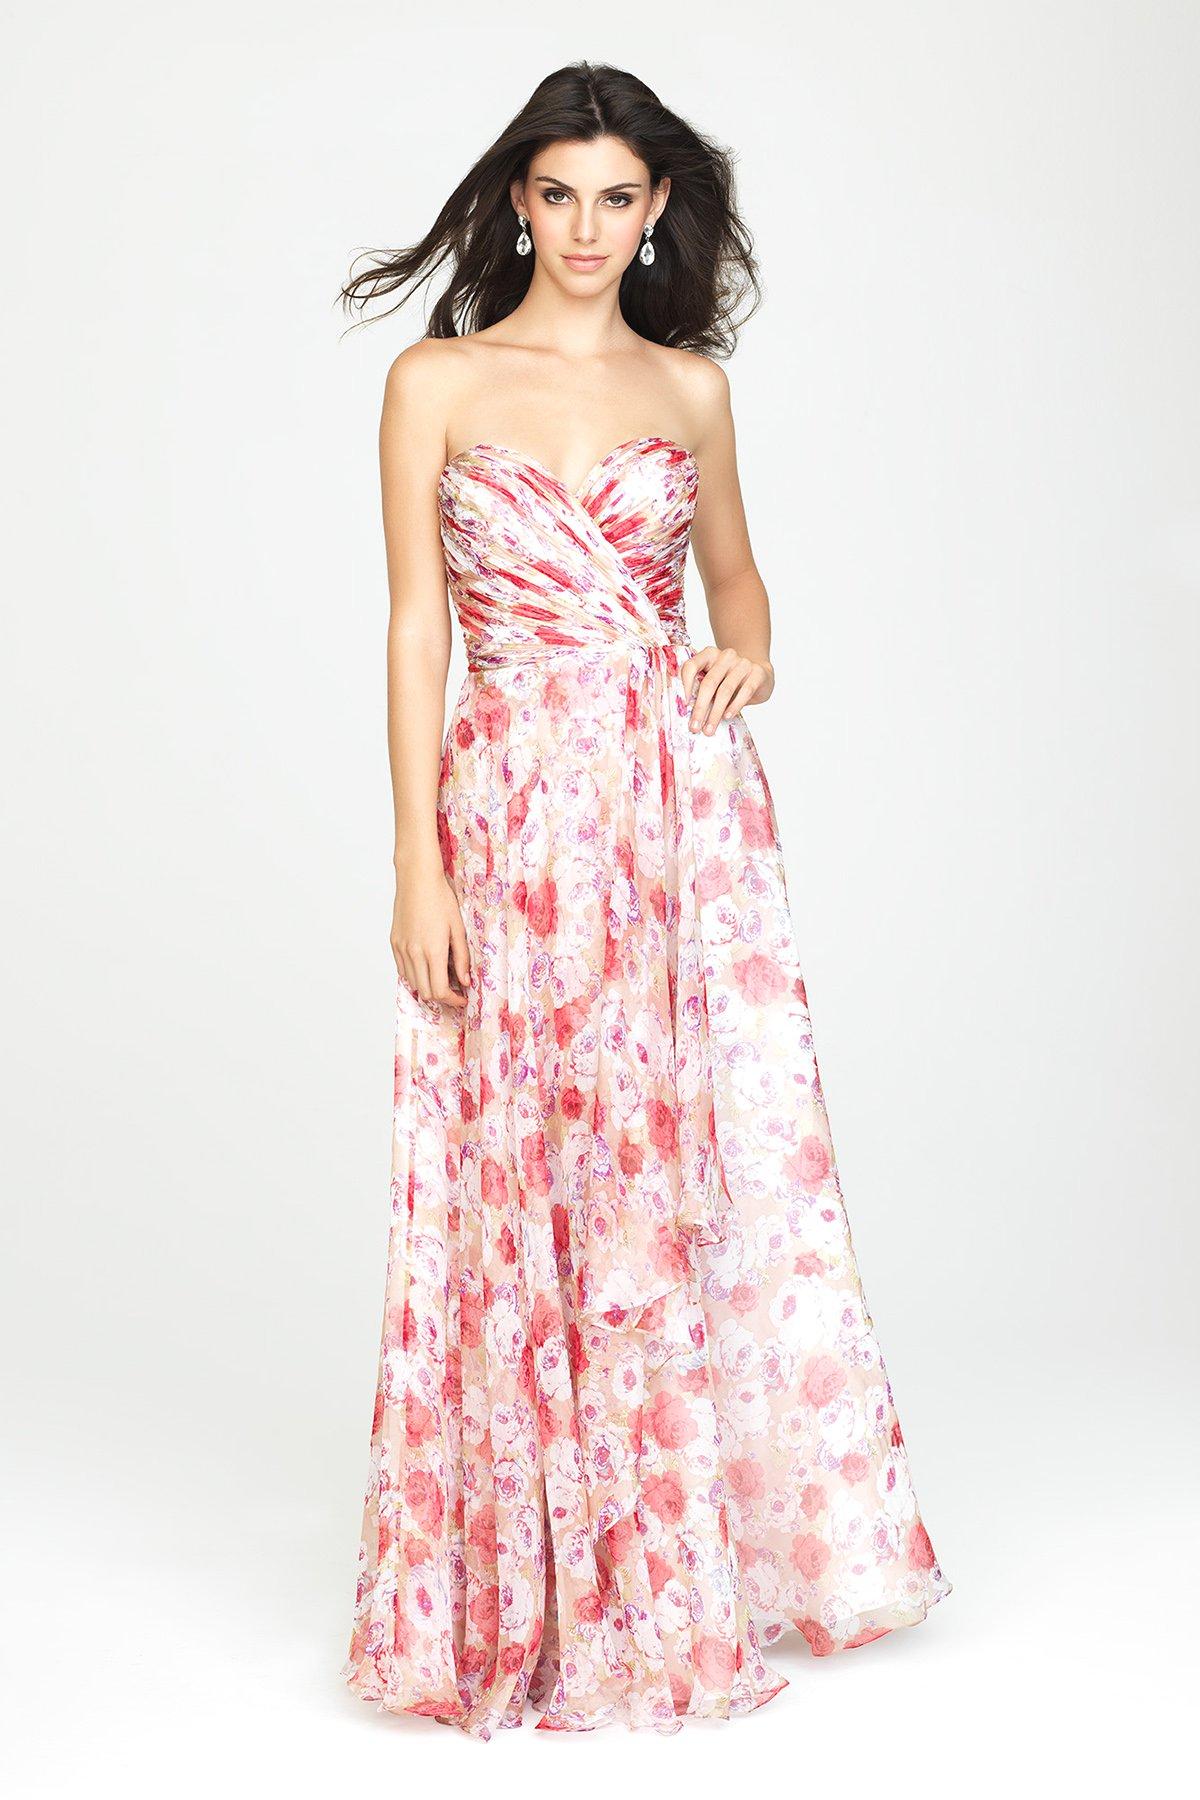 floral bridesmaid dresses Allure 1436F